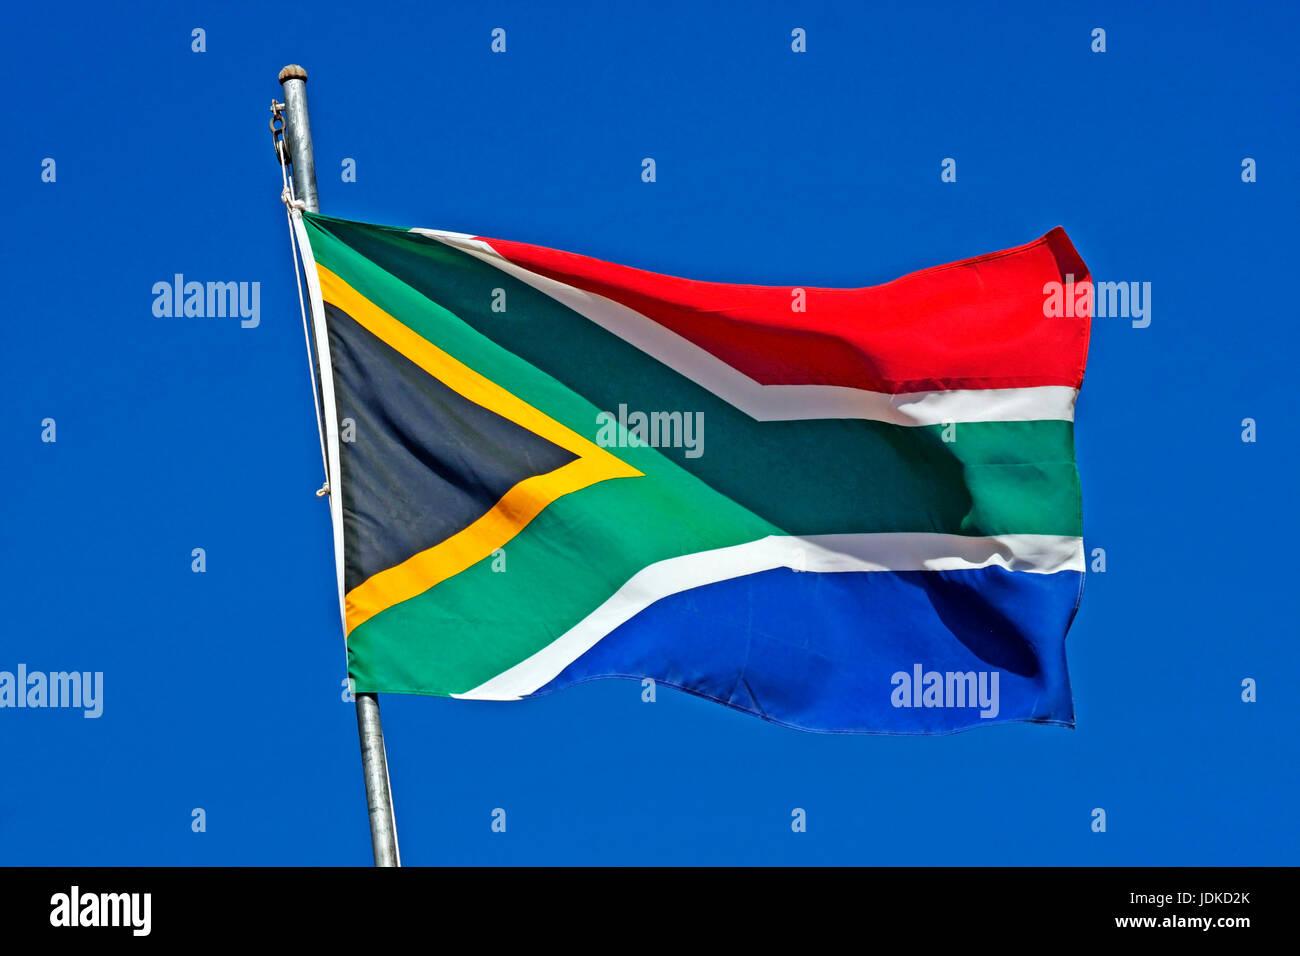 Flag of South Africa, Flagge von Suedafrika - Stock Image